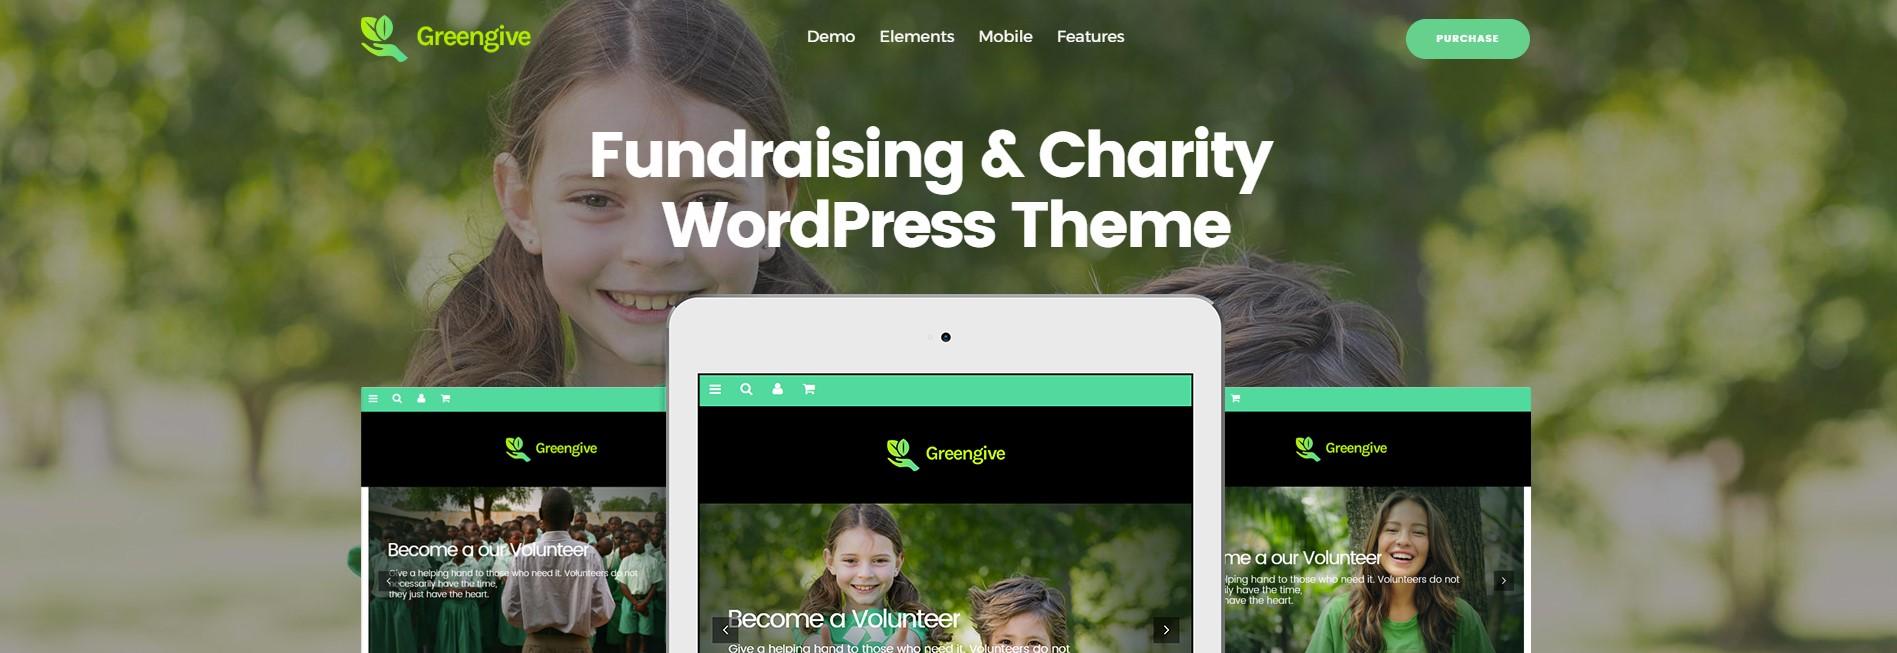 GreenGive Fundraising Charity WordPress Theme